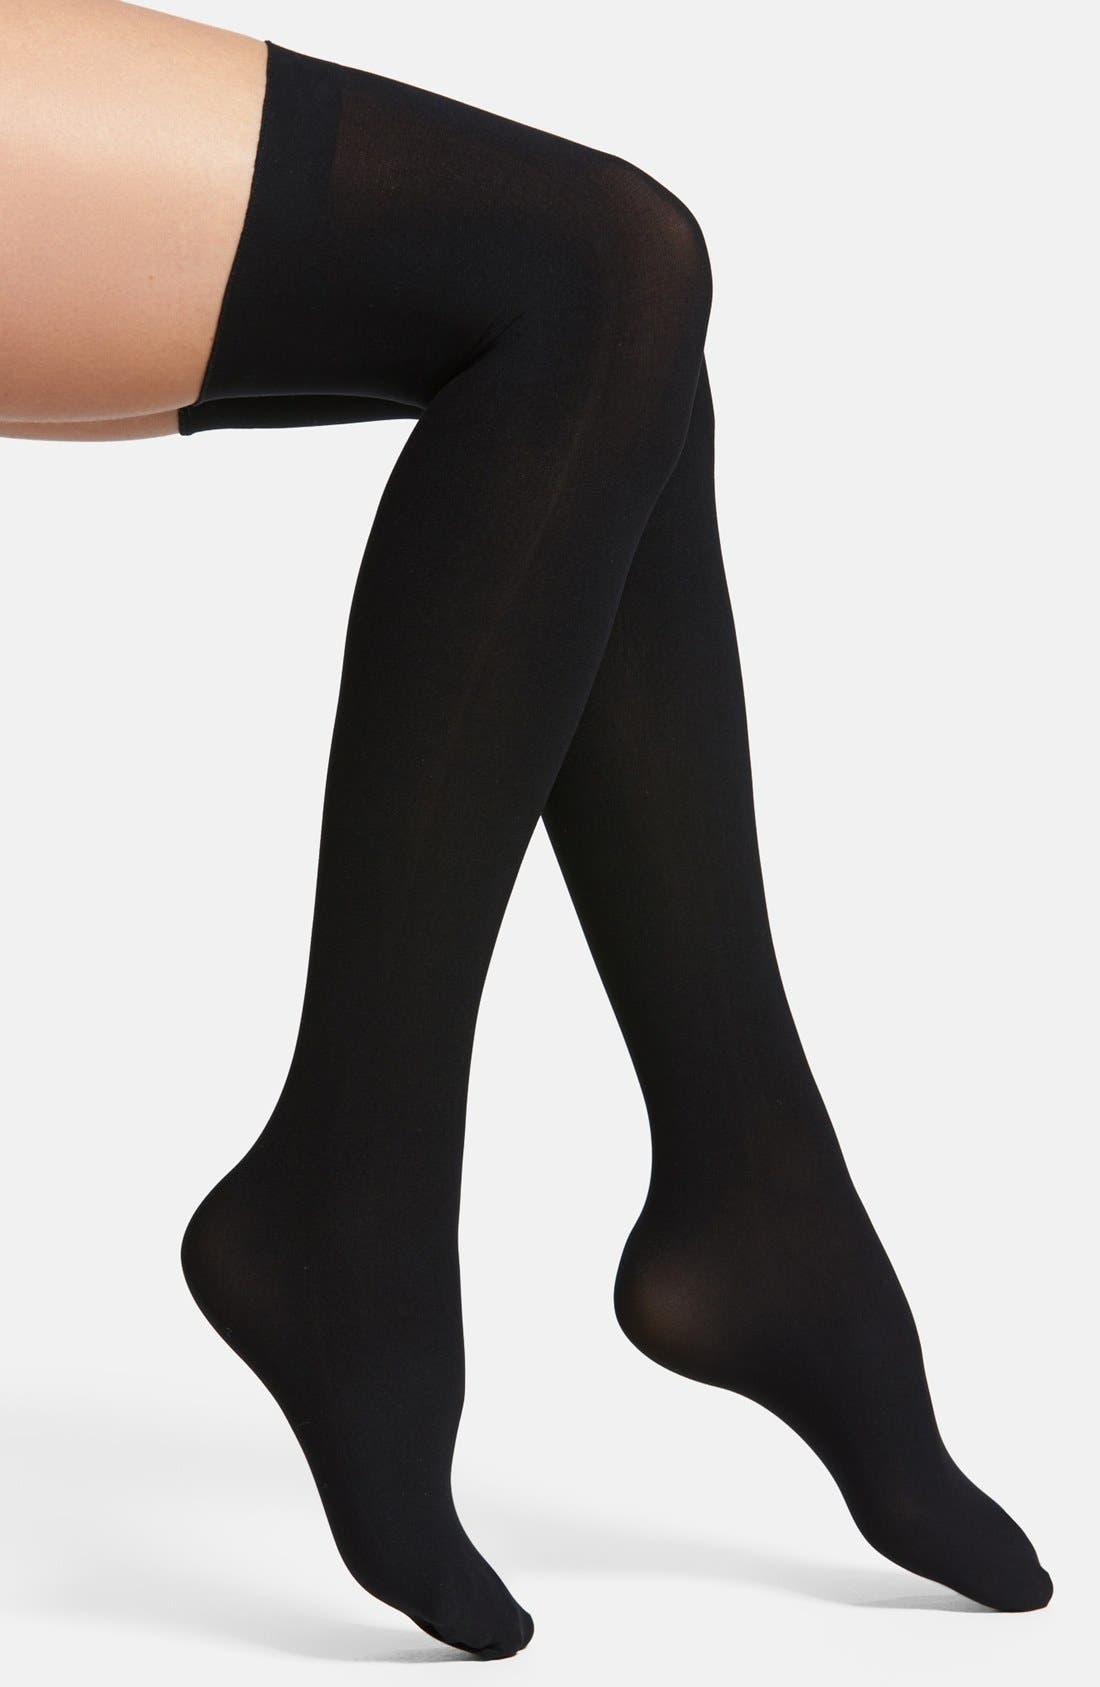 Up All Night Thigh High Socks,                         Main,                         color, Black